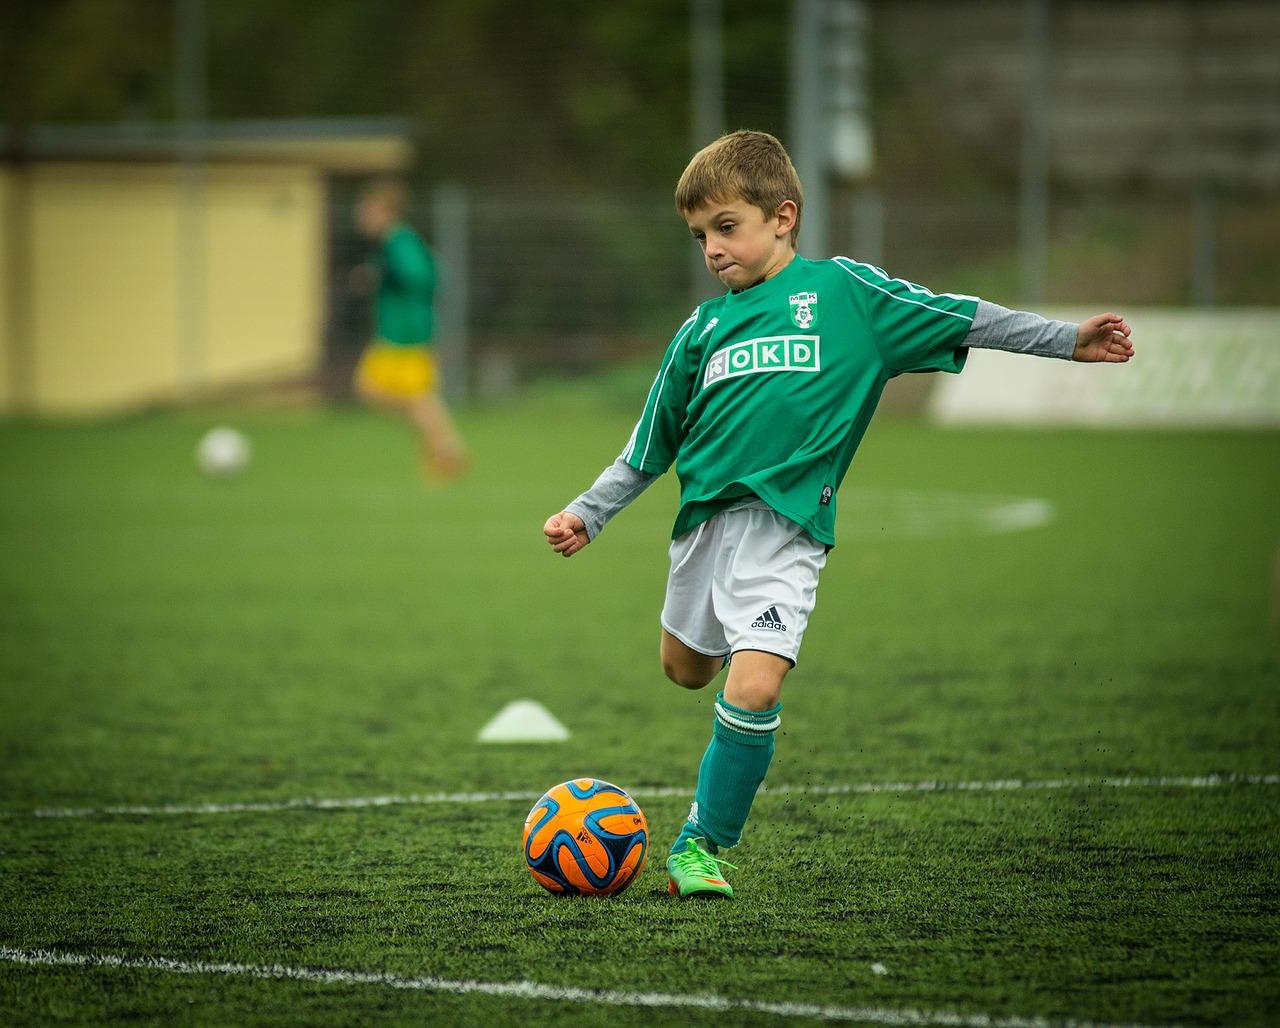 file/ELEMENTO_NEWSLETTER/20116/Sport_calcio_bambino_child-613199_1280.jpg